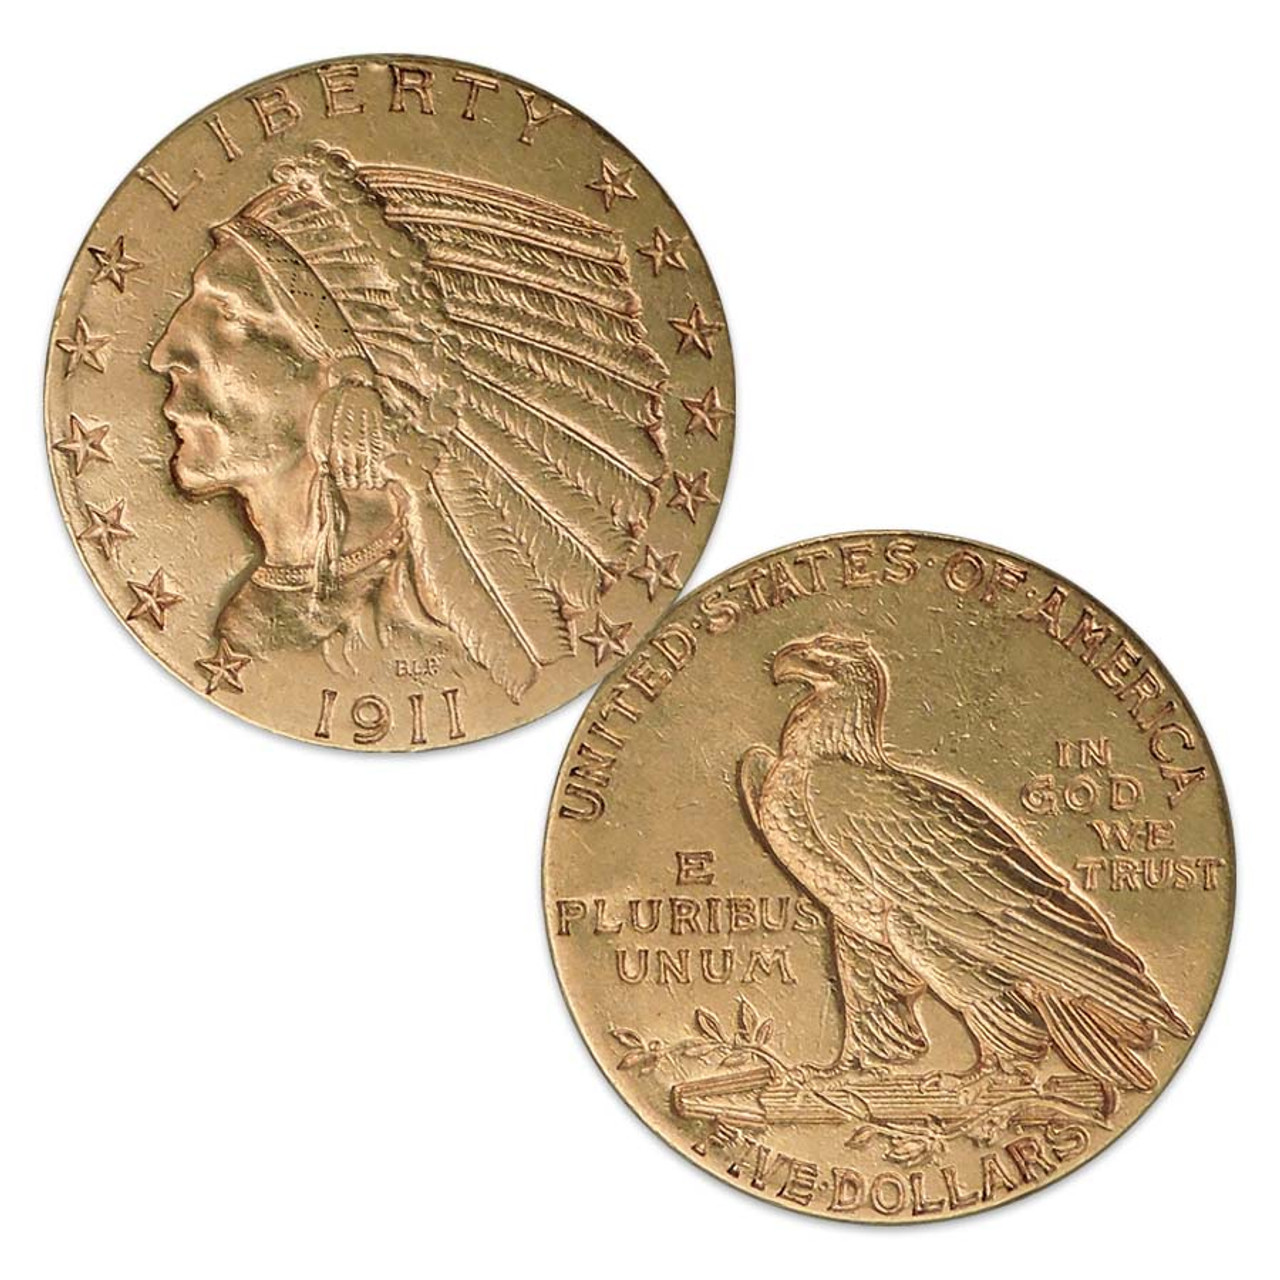 U.S. 1908-1929 Indian Head $5 Gold Extra Fine